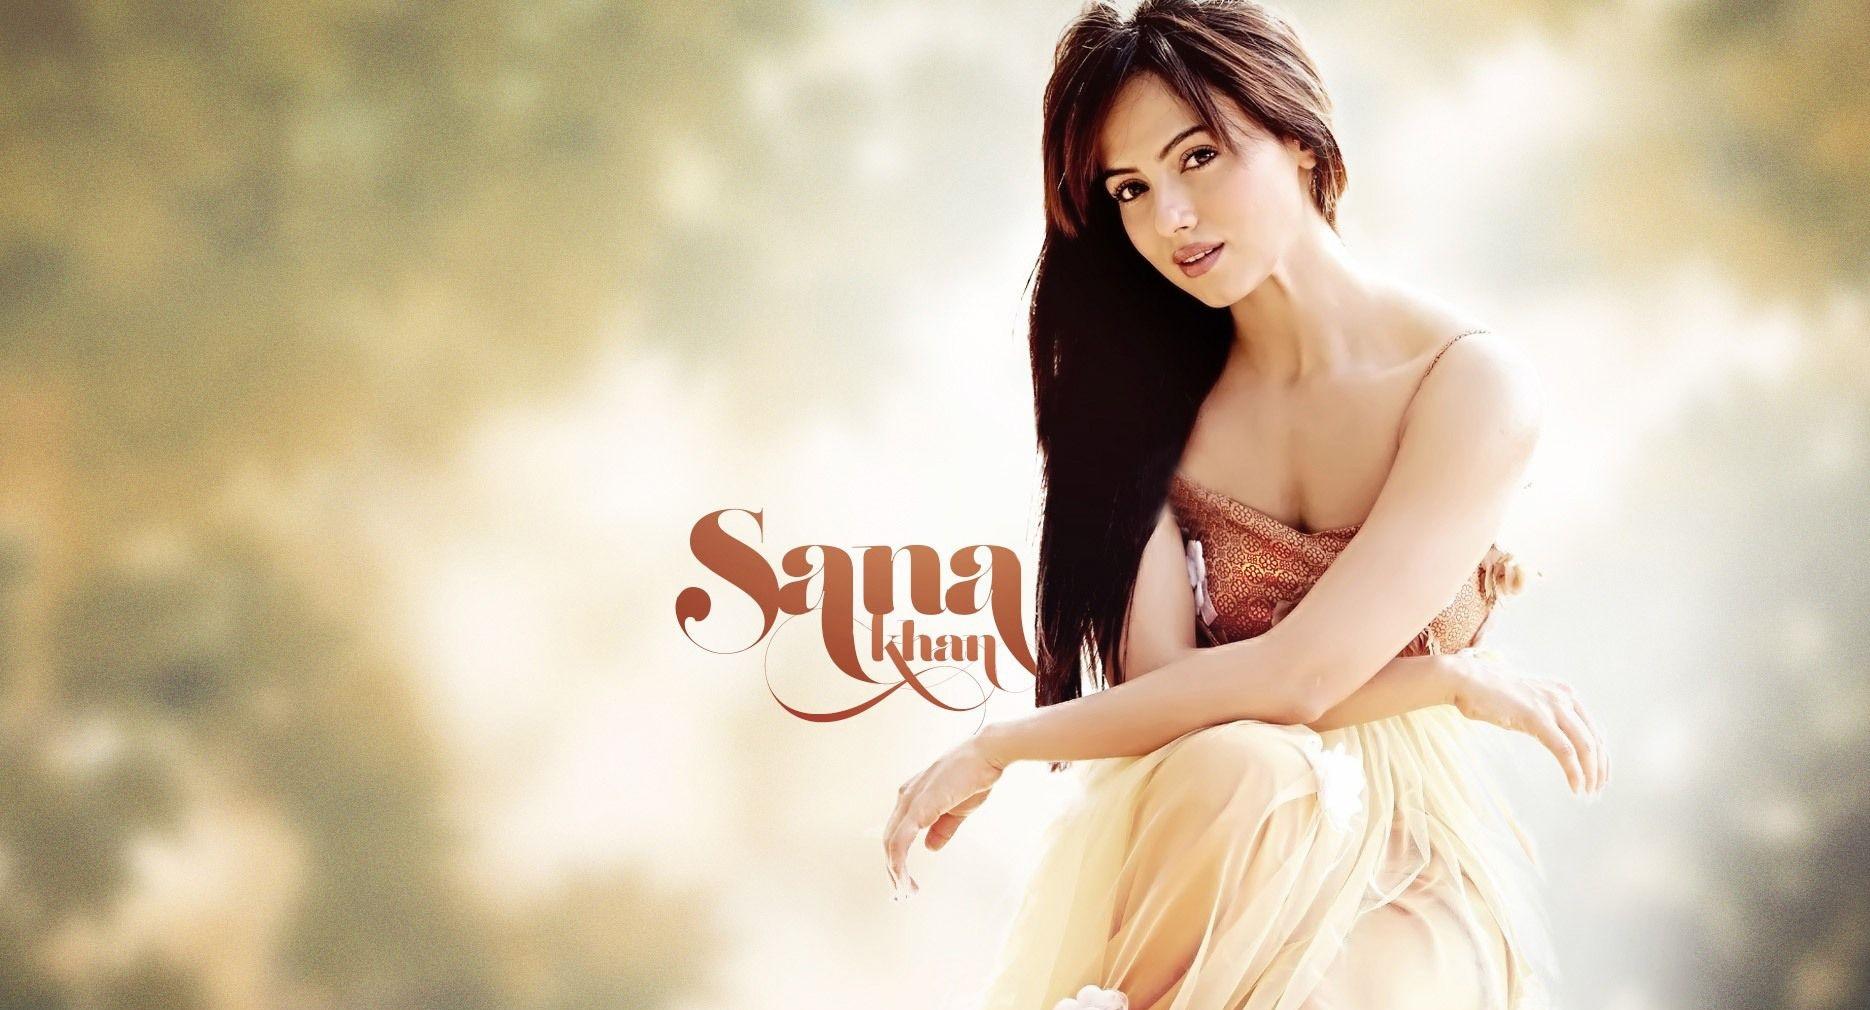 Sana Khan New Gorgeous Wallpaper Wallpaper, HD Indian